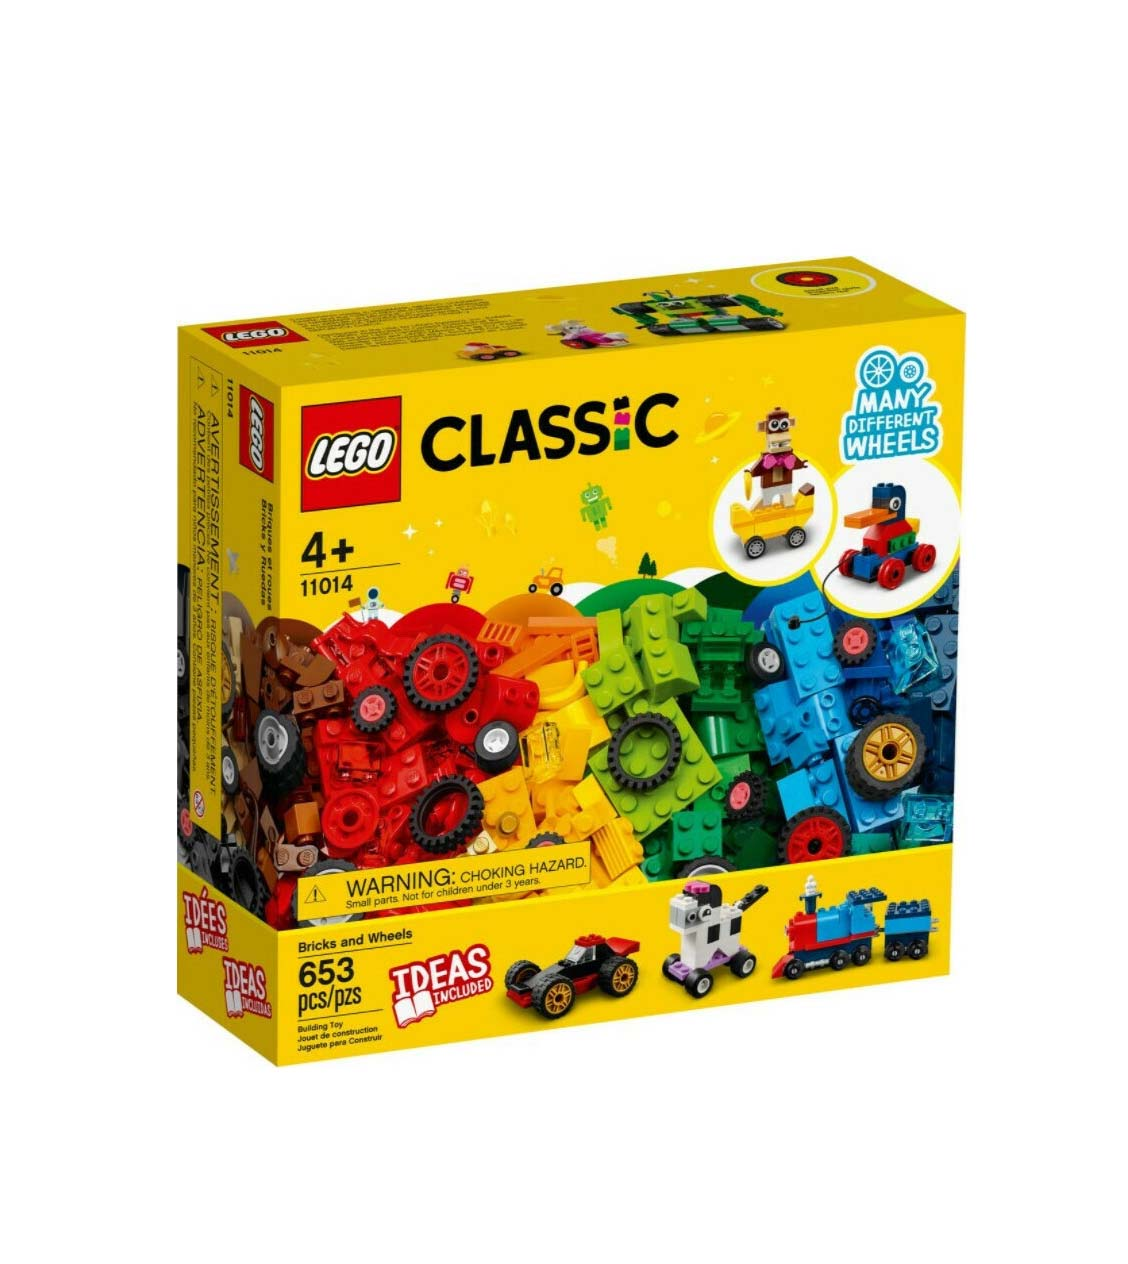 Lego Classic: Bricks and Wheels 11014